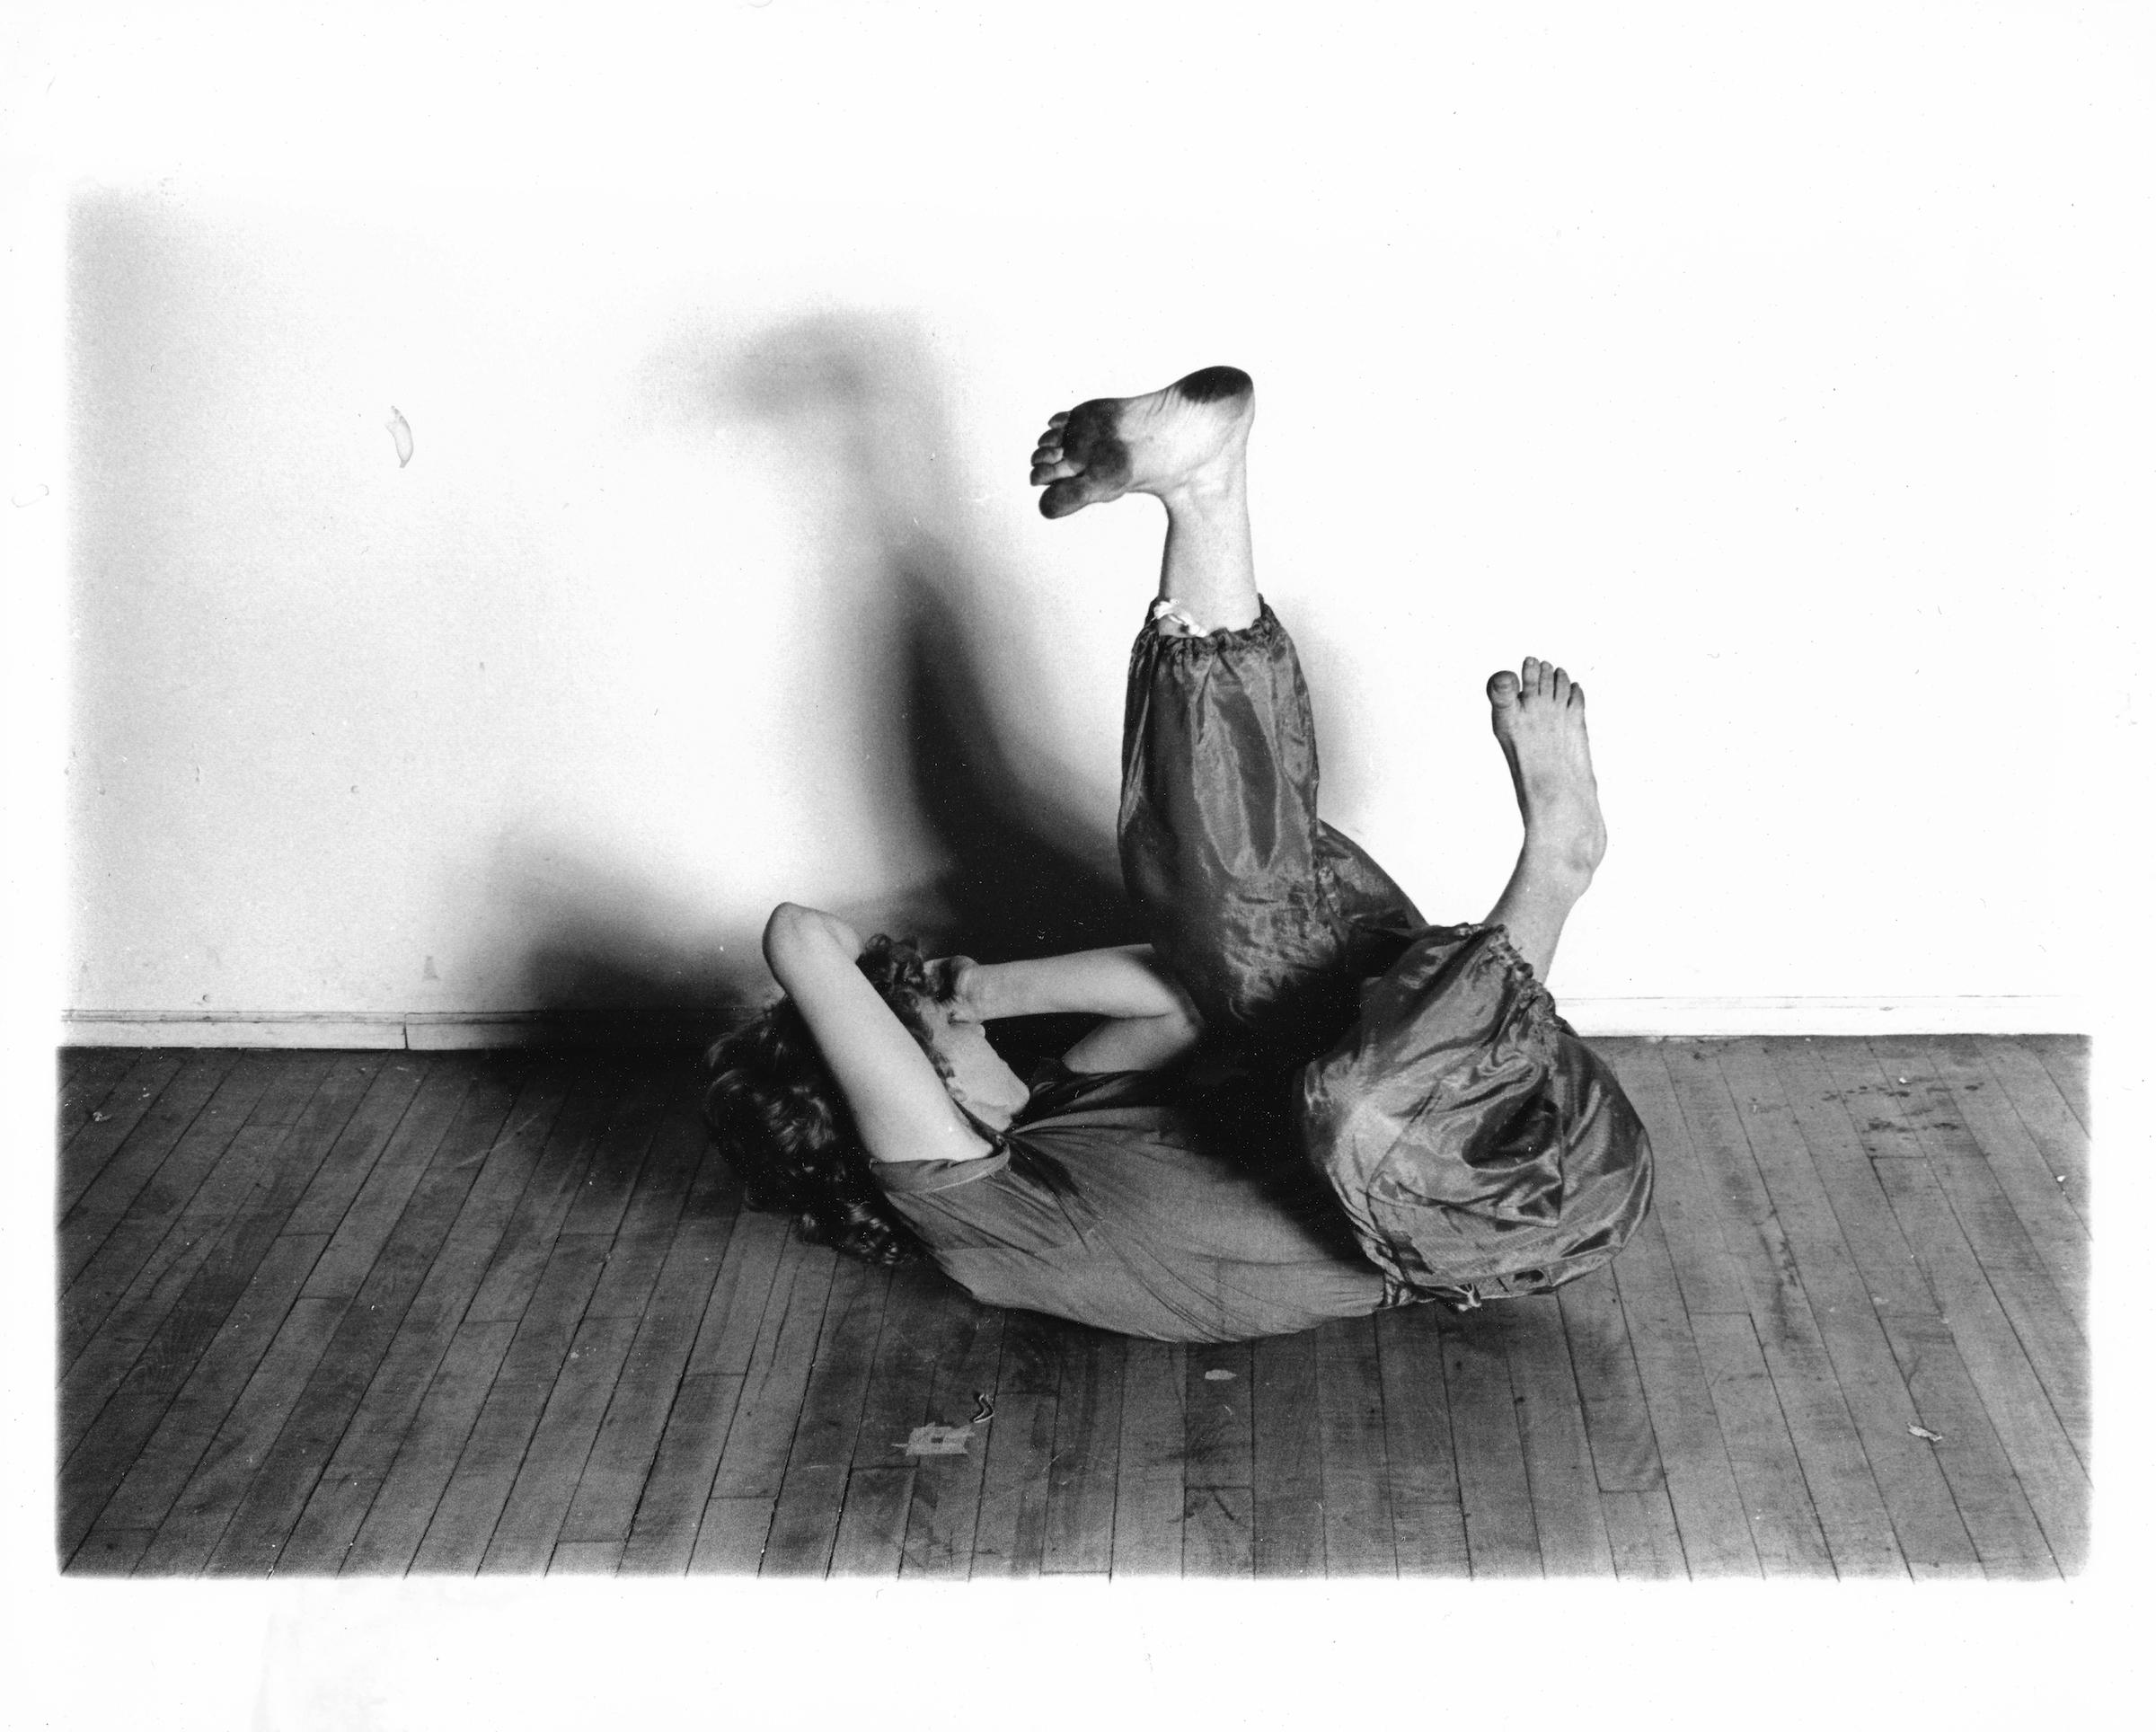 Pooh Kaye & Marcia Resnick, Pooh #23, 1976, silver gelatin print, 11 x 14 in